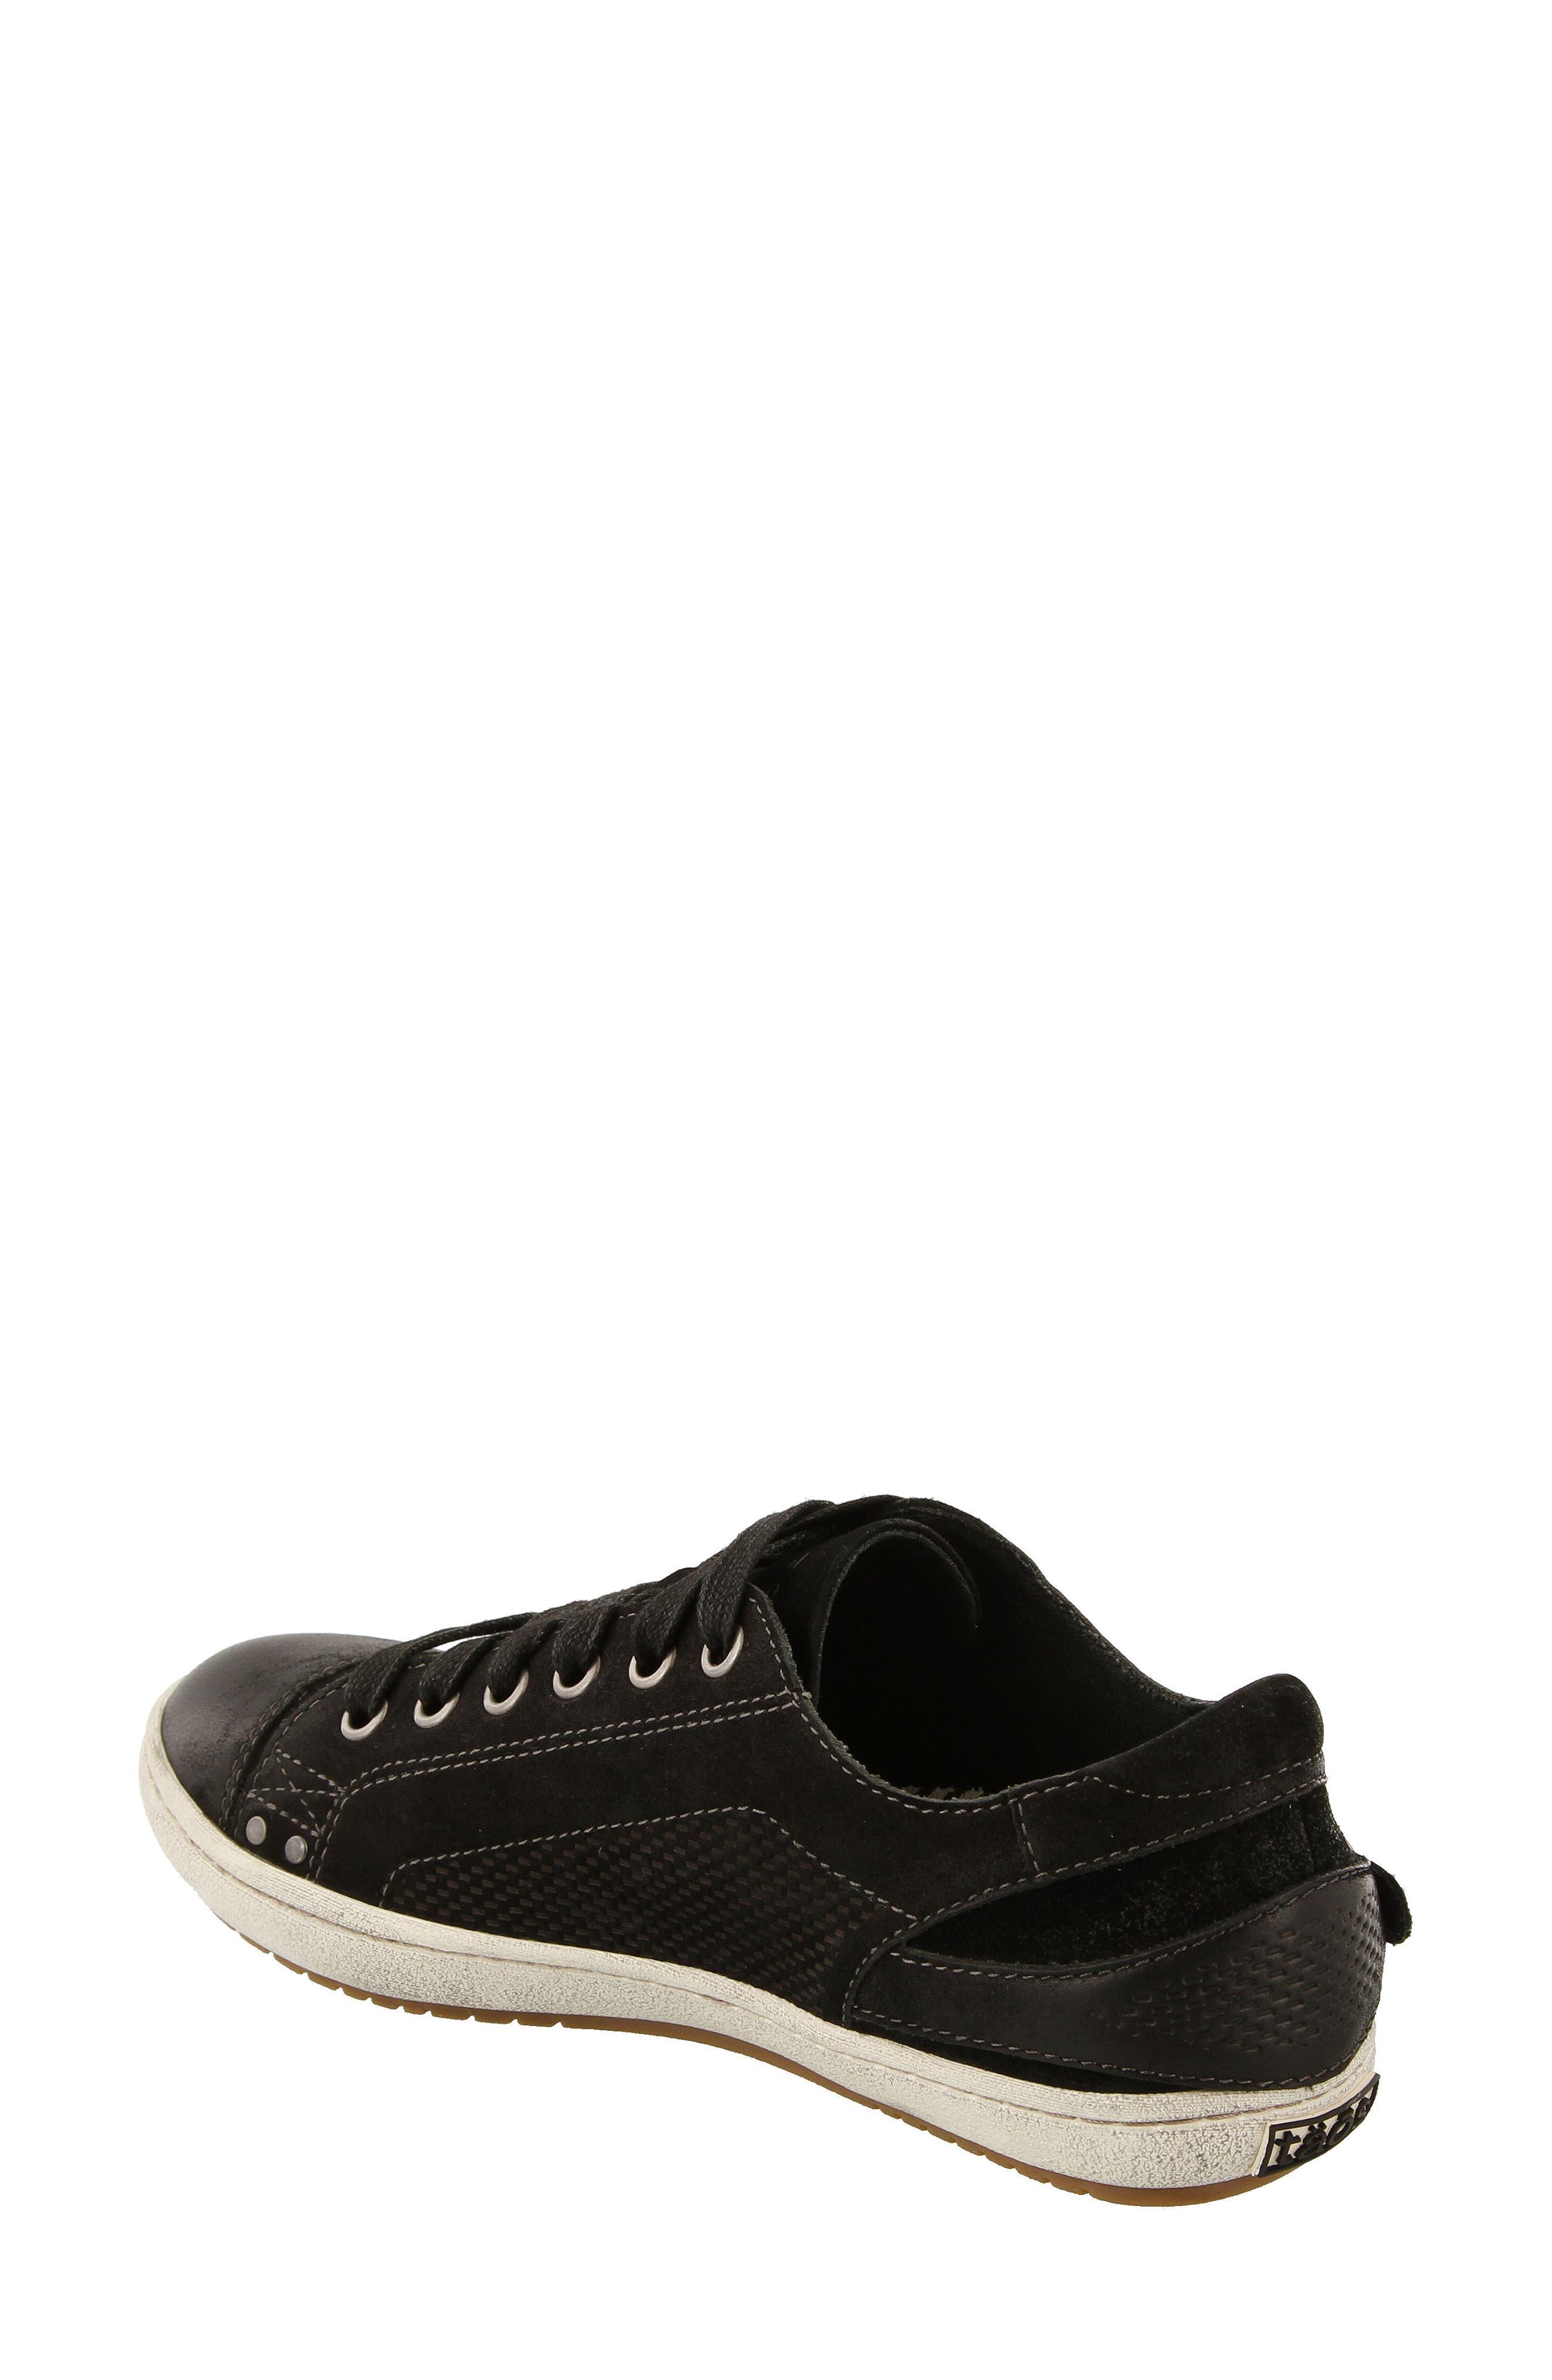 Capitol Sneaker,                             Alternate thumbnail 2, color,                             001